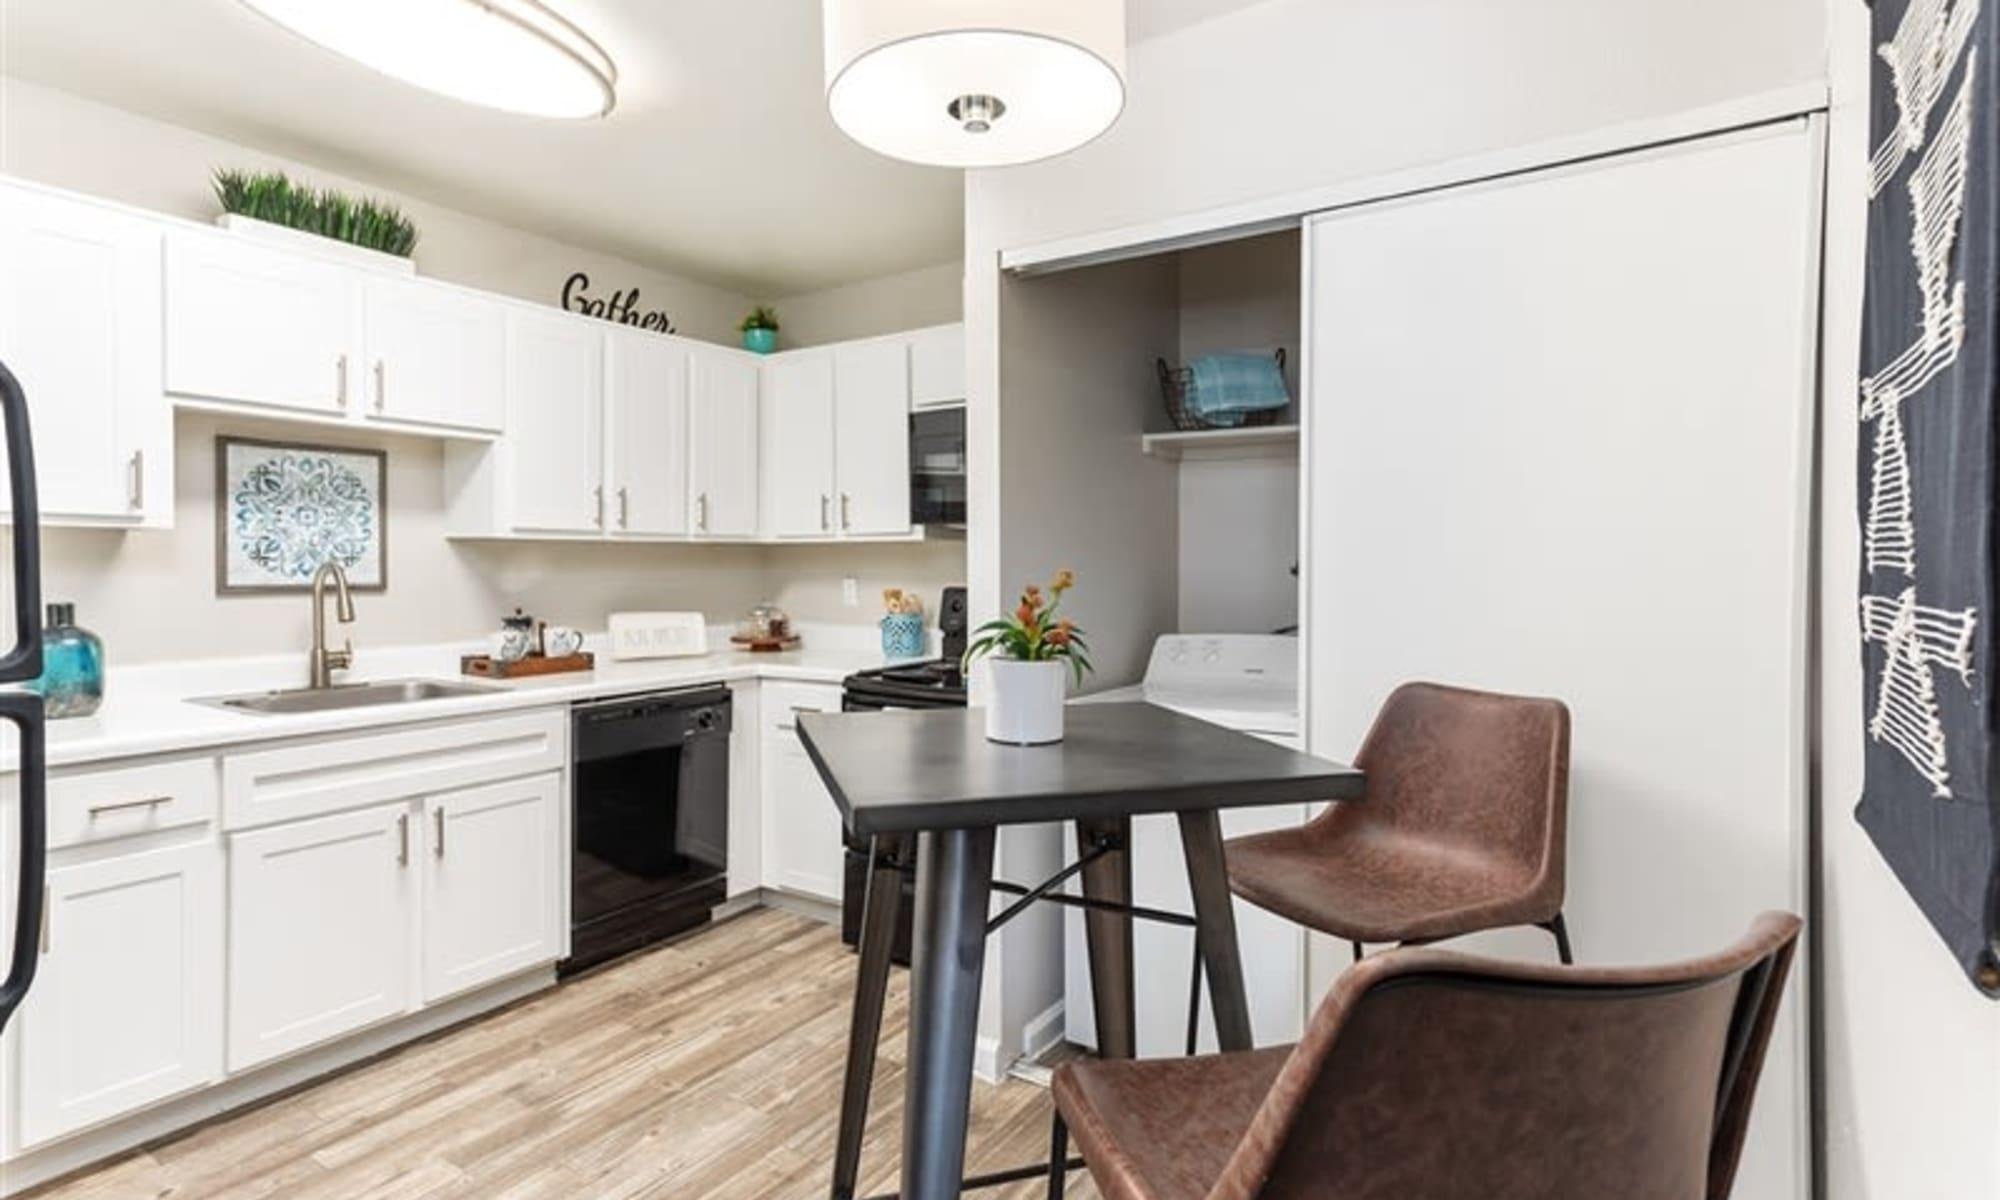 Argenta Apartments apartment homes in Mesa, Arizona